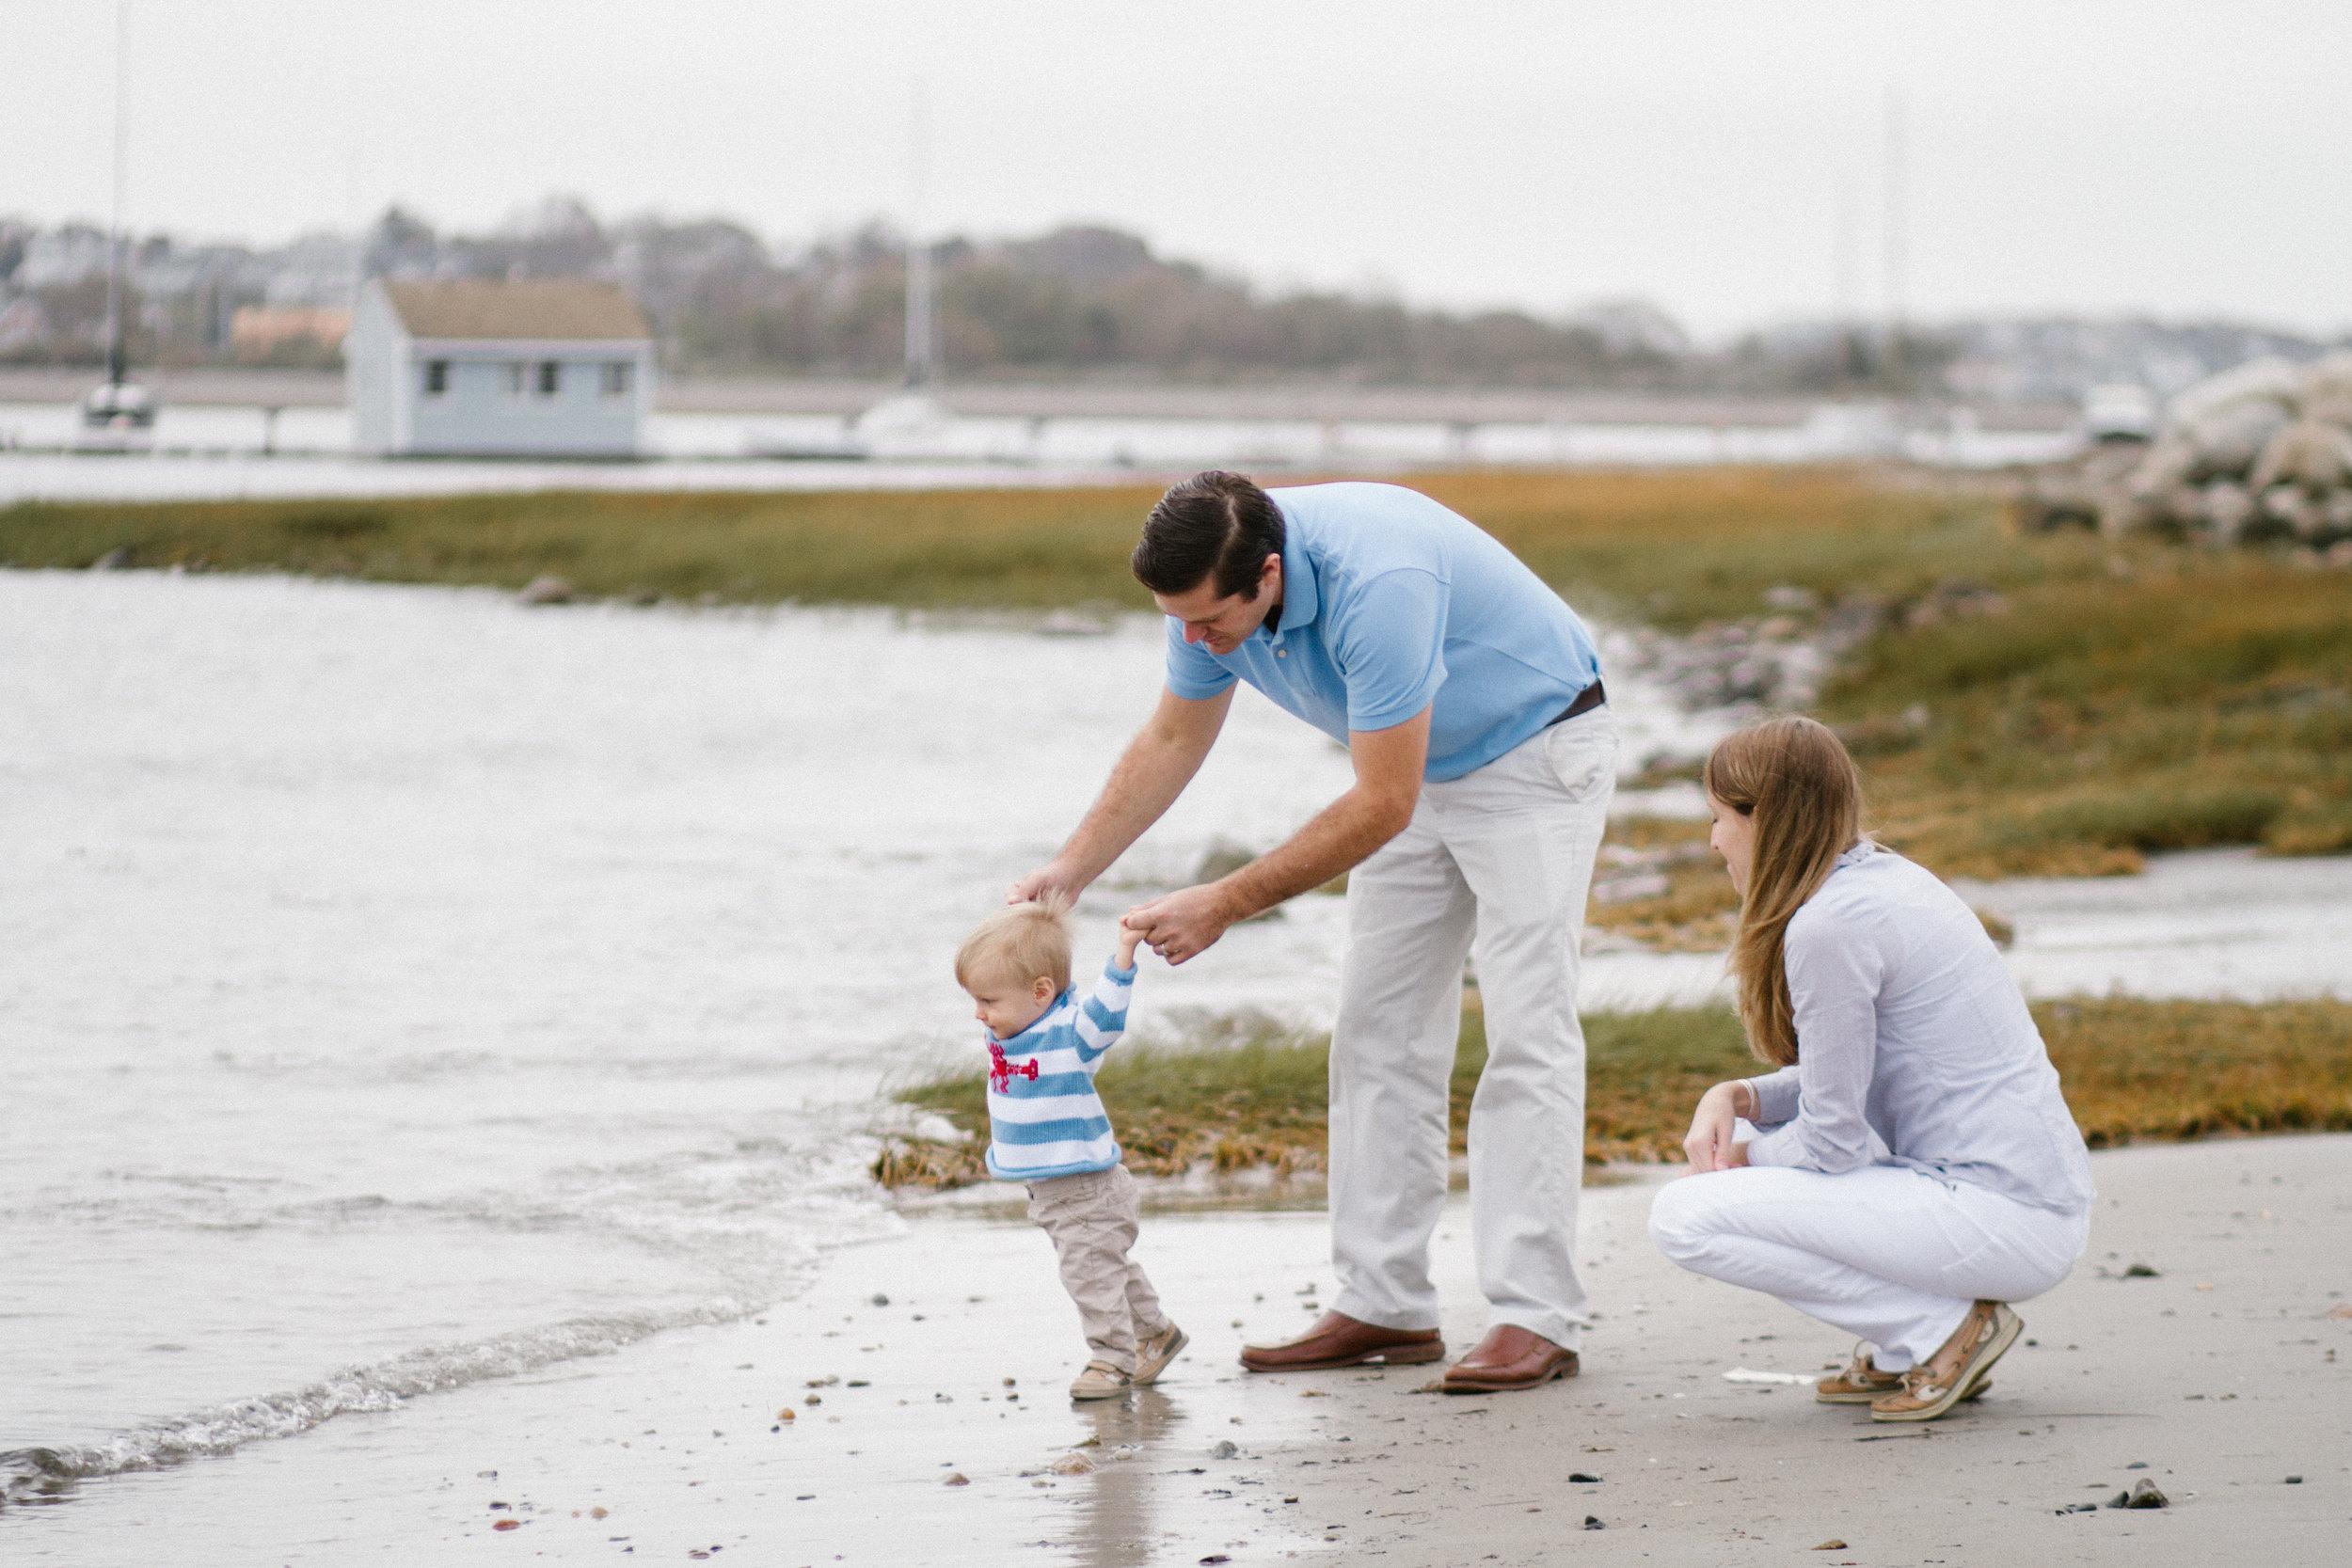 Scituate Family Photographer, Duxbury Family Photographer, Scituate Massachusetts, Shannon Sorensen Photography, Connecticut Family Photographer